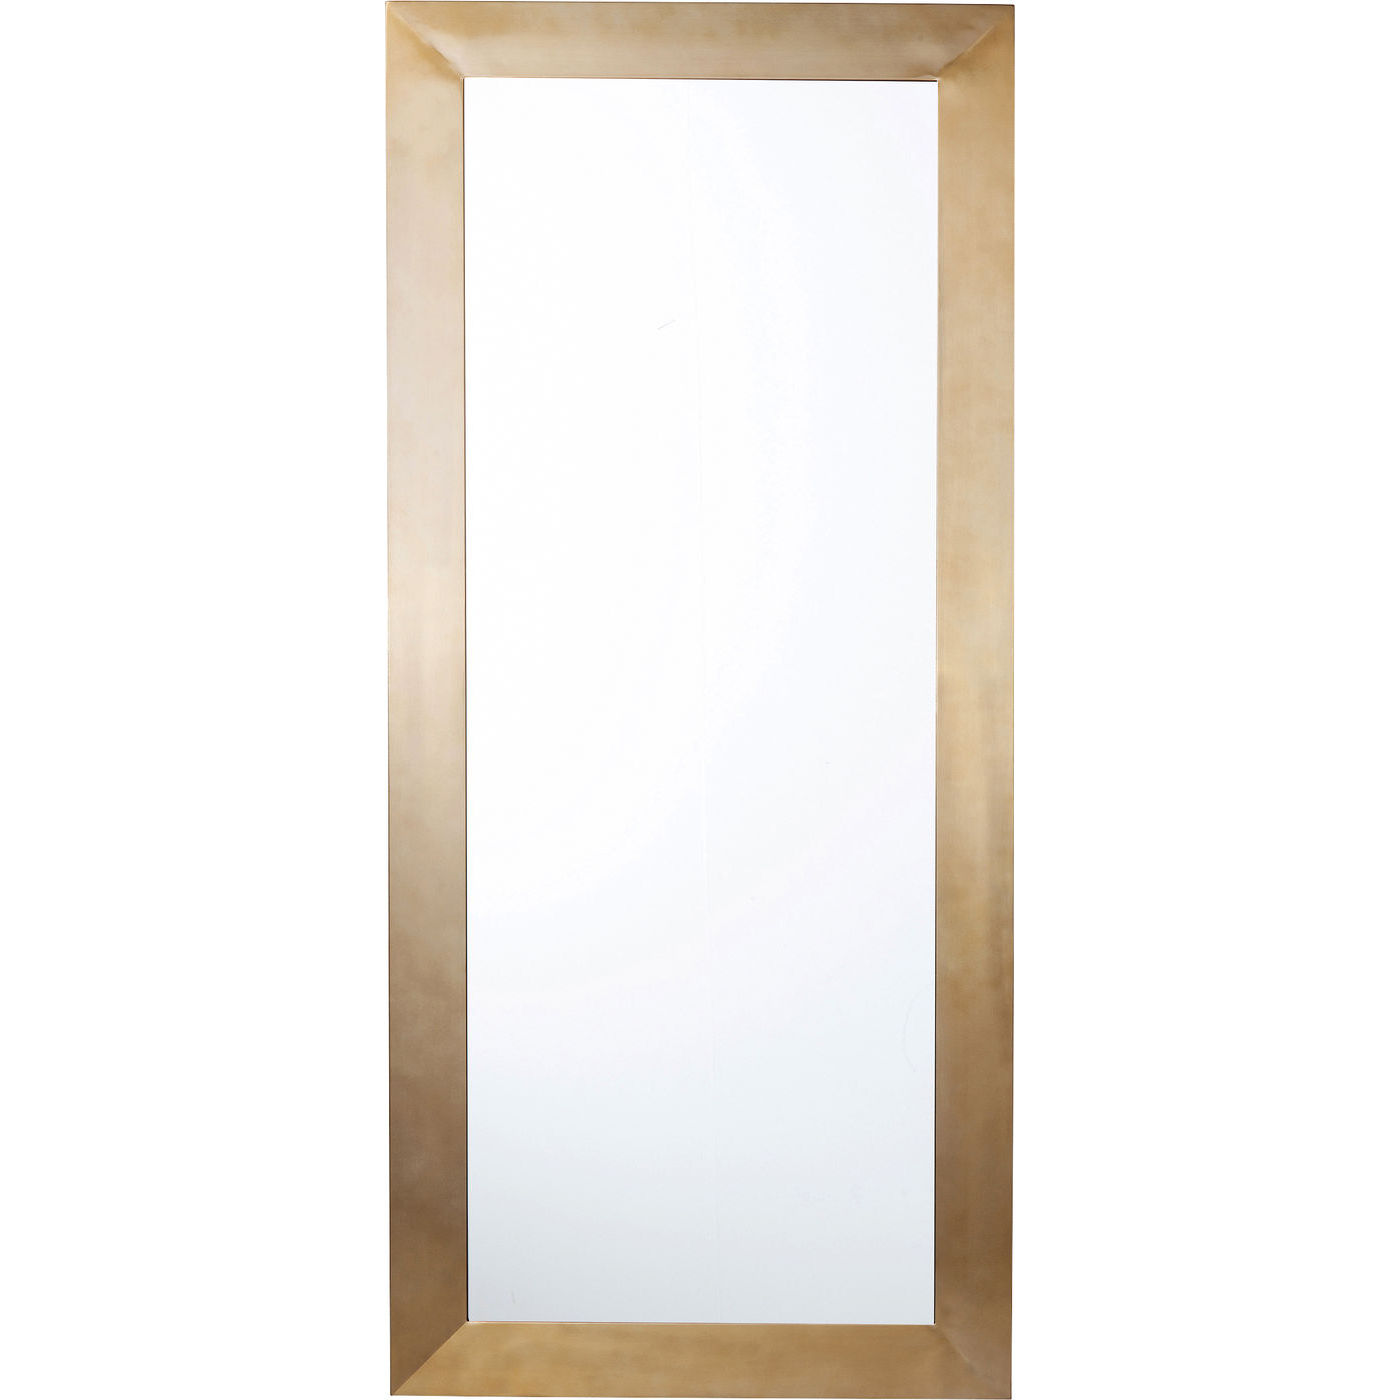 KARE DESIGN Thunder vægspejl - spejlglas/messing stål, rektangulær (180x80)